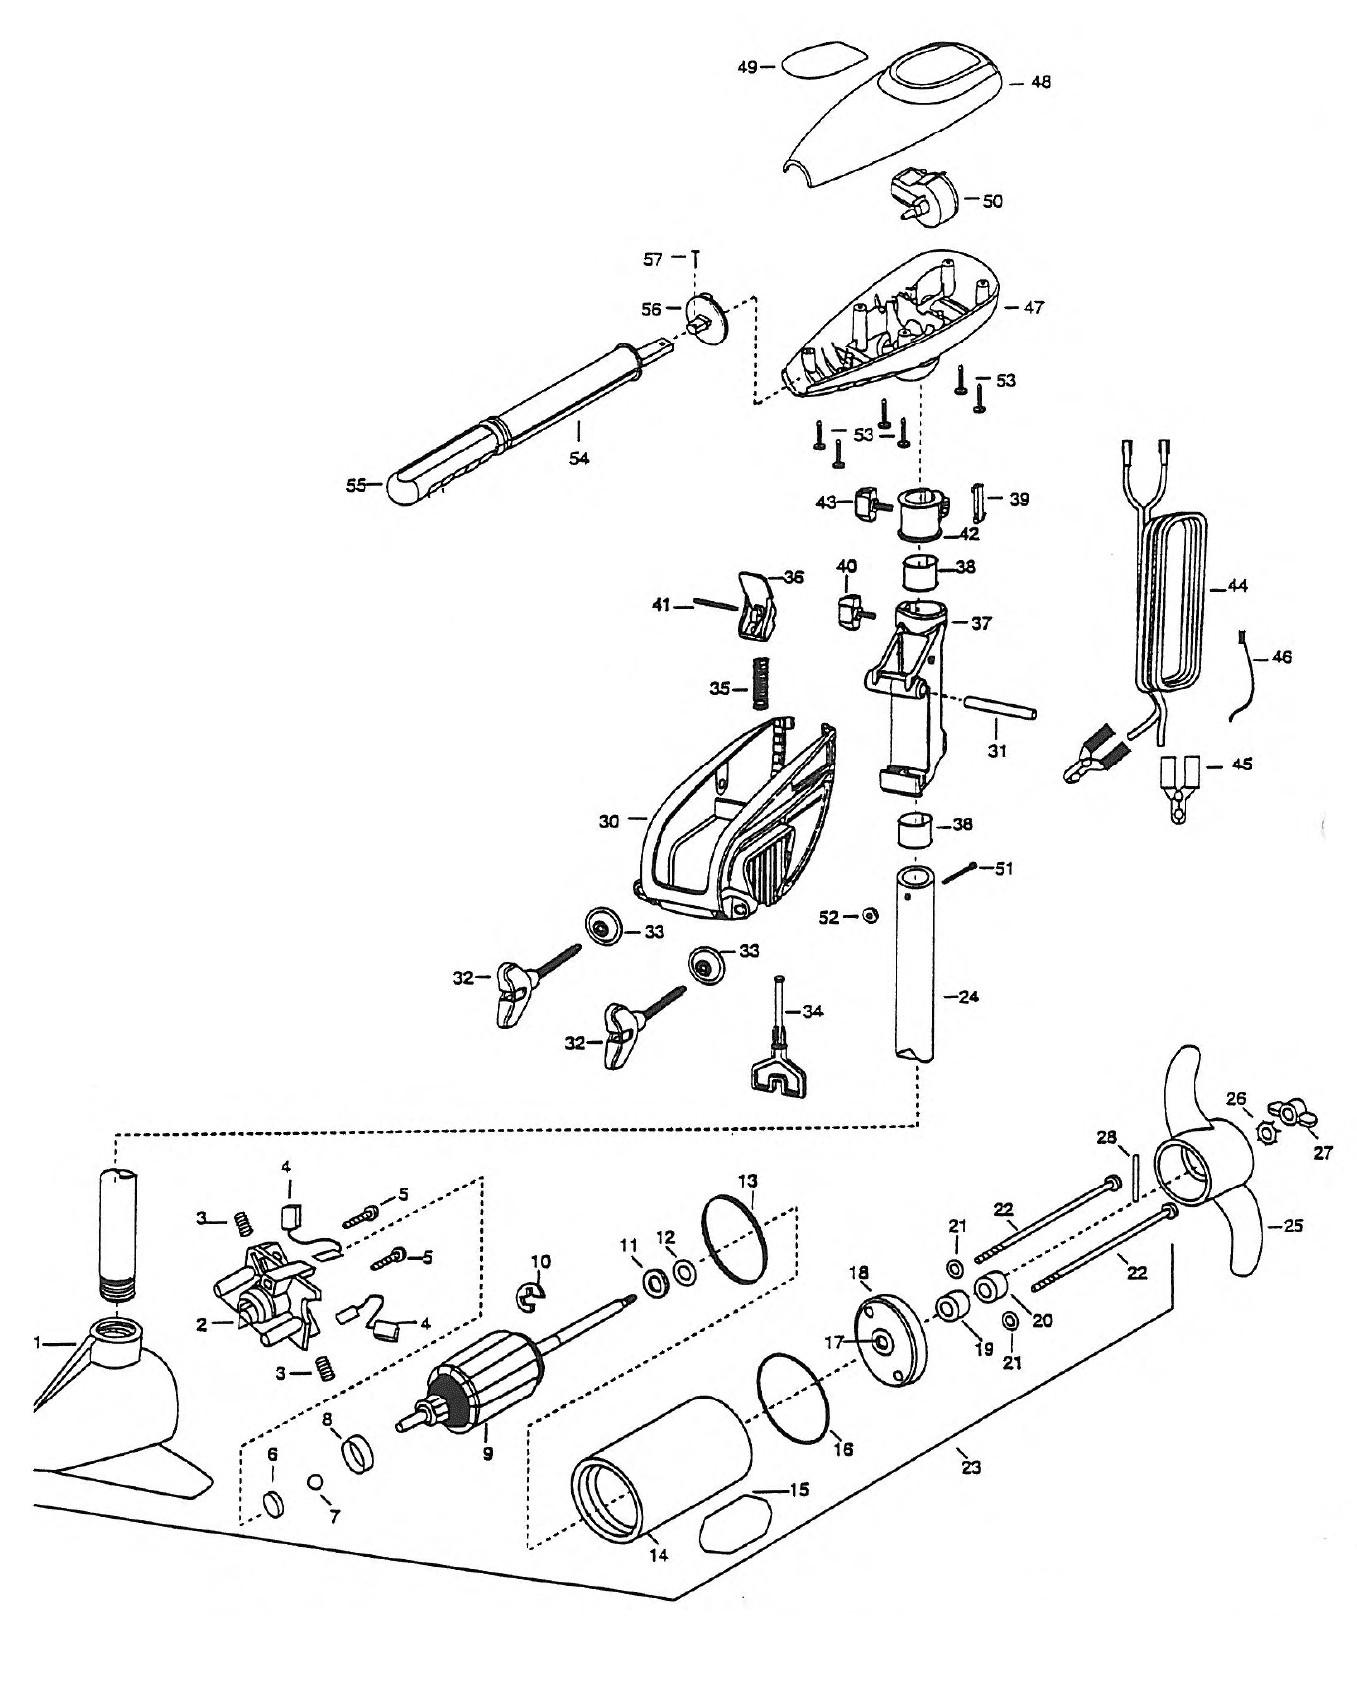 Minn Kota Trolling Motor Parts Breakdown